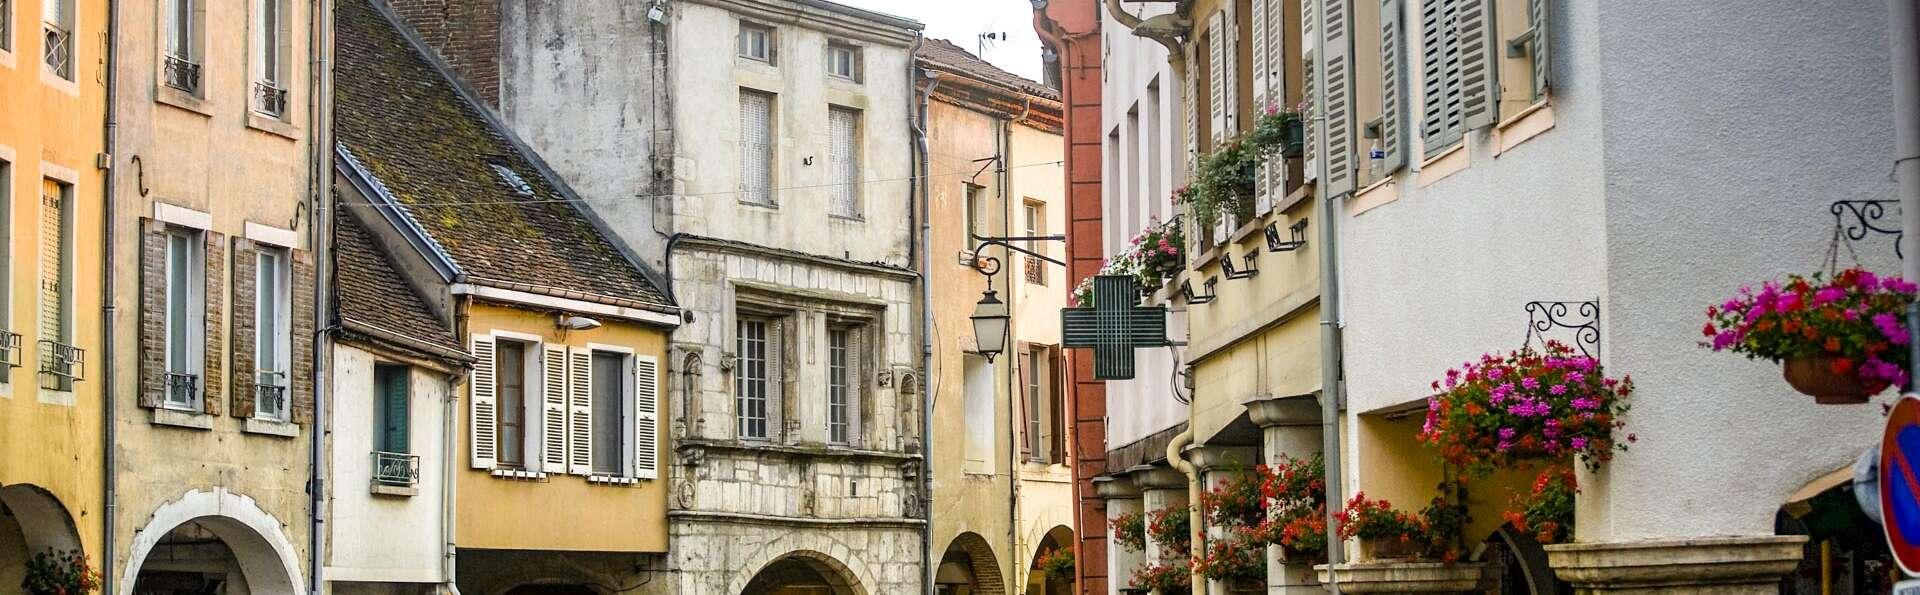 Hôtel Spa Frédéric Carrion - EDIT_DESTINATION_02.jpg